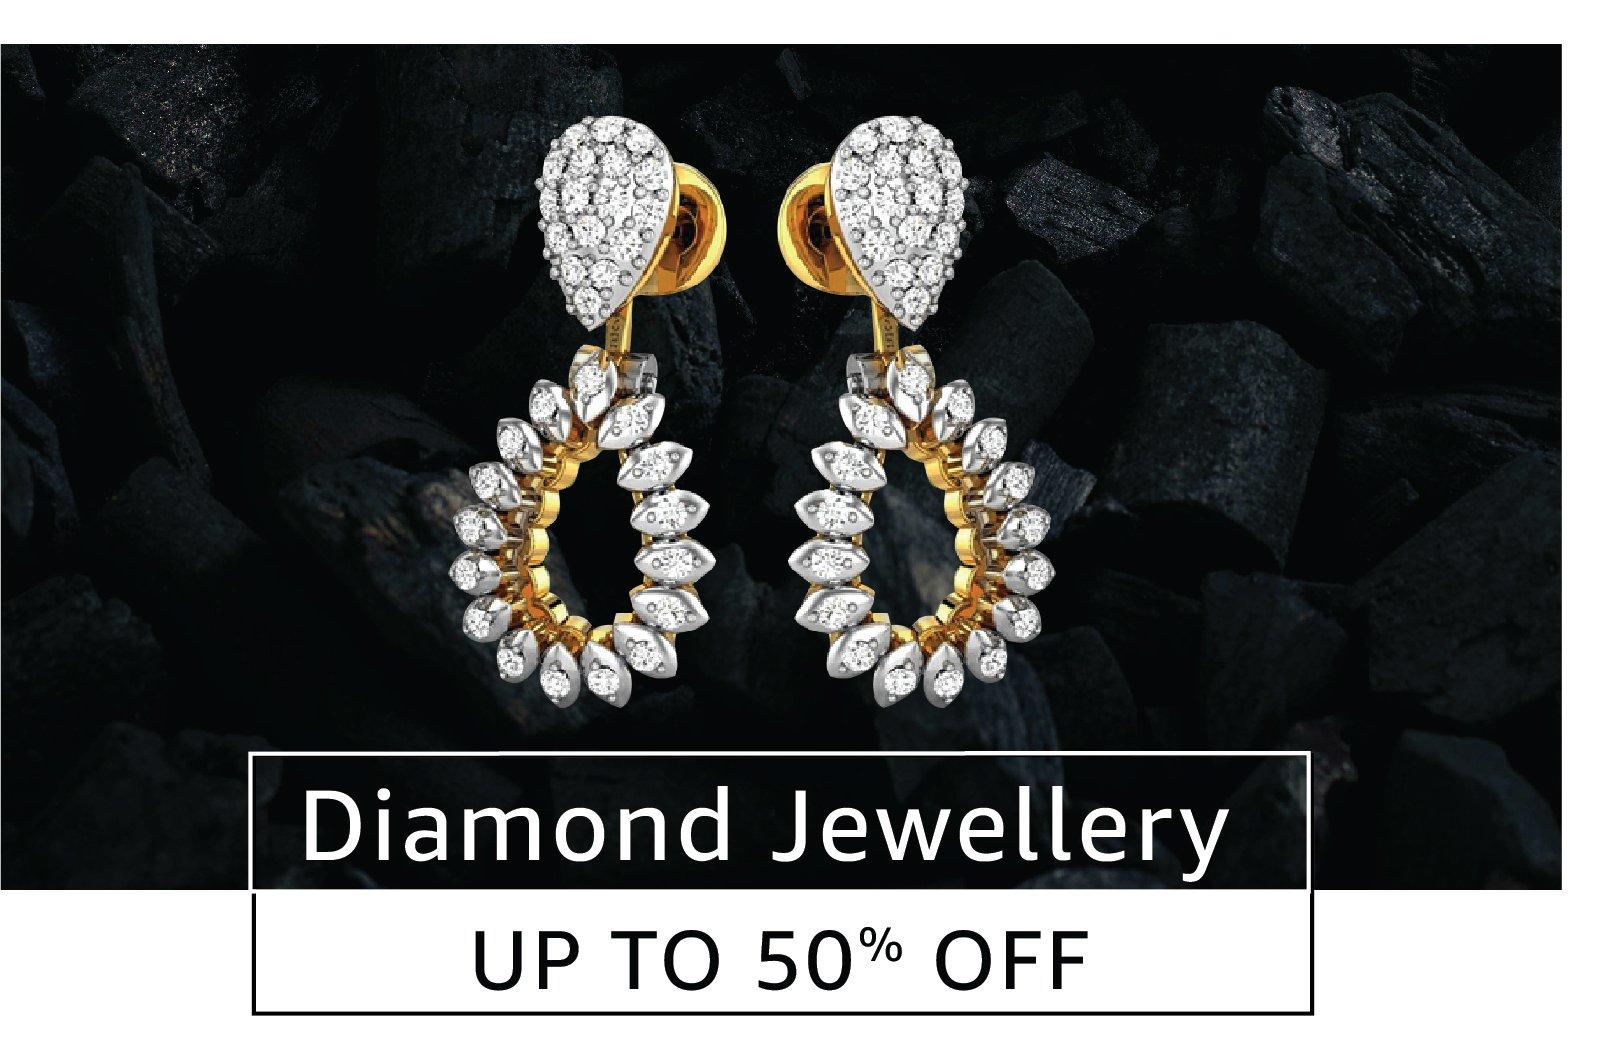 Diamond Jewellery Up to 50% off